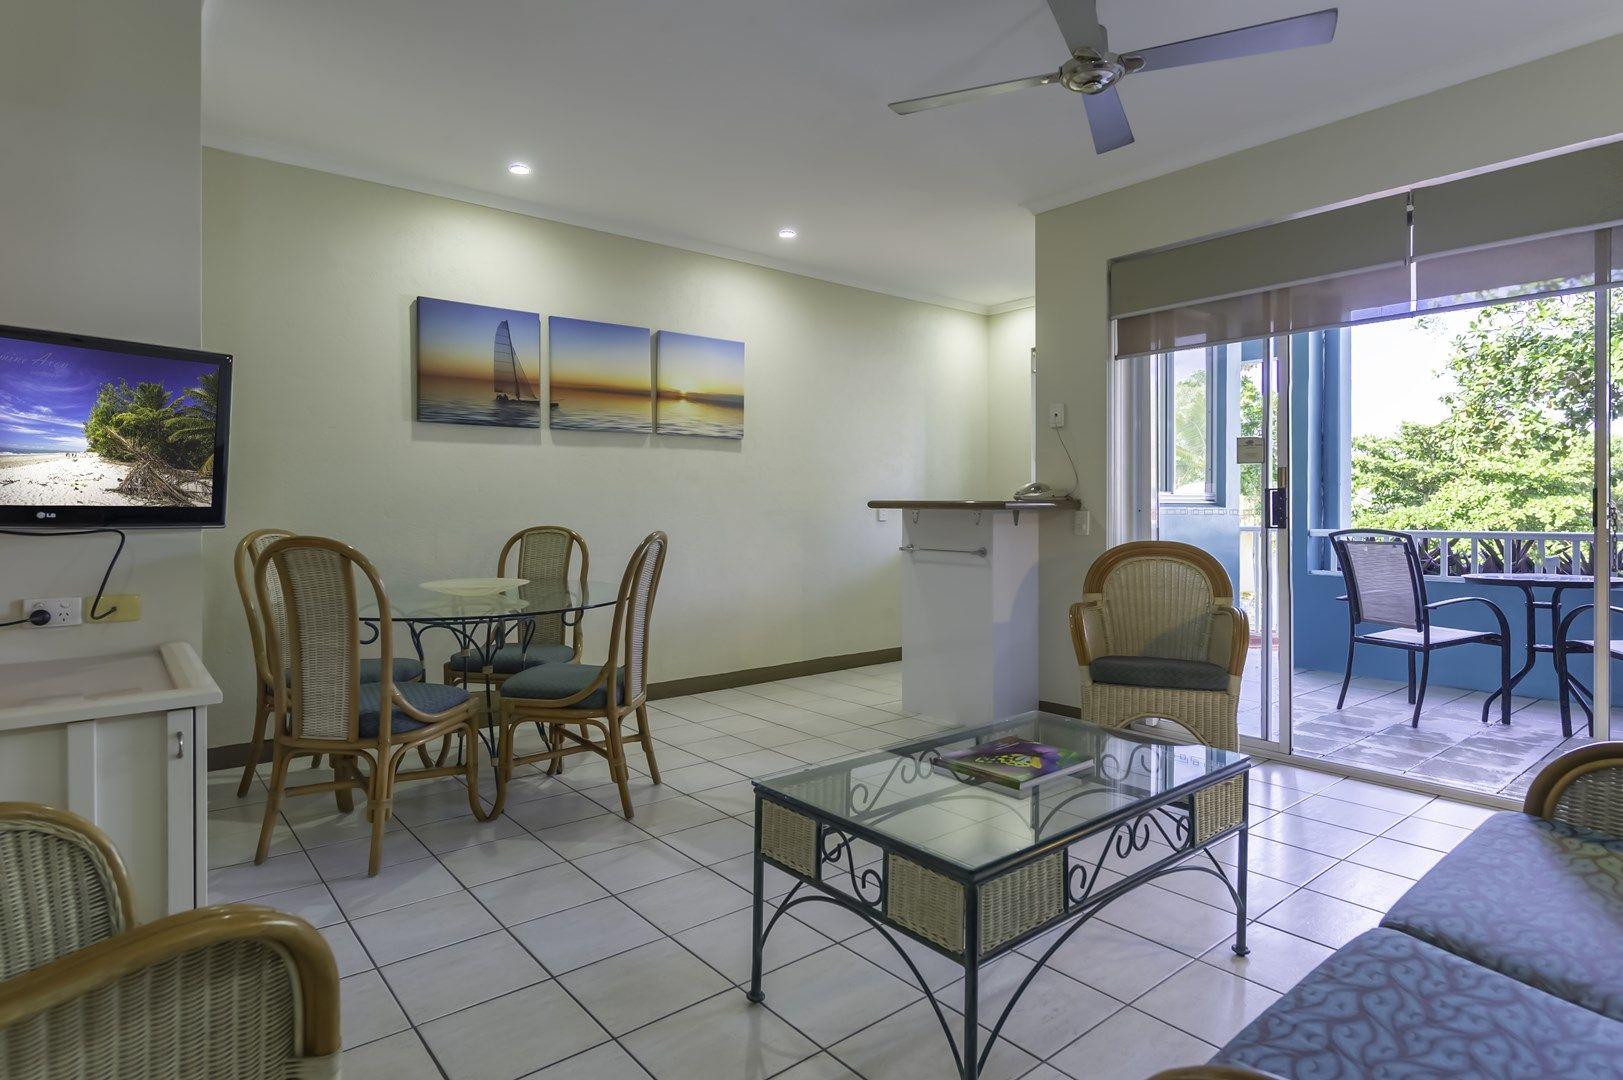 7/34 Macrossan Street, Port Douglas QLD 4877, Image 0